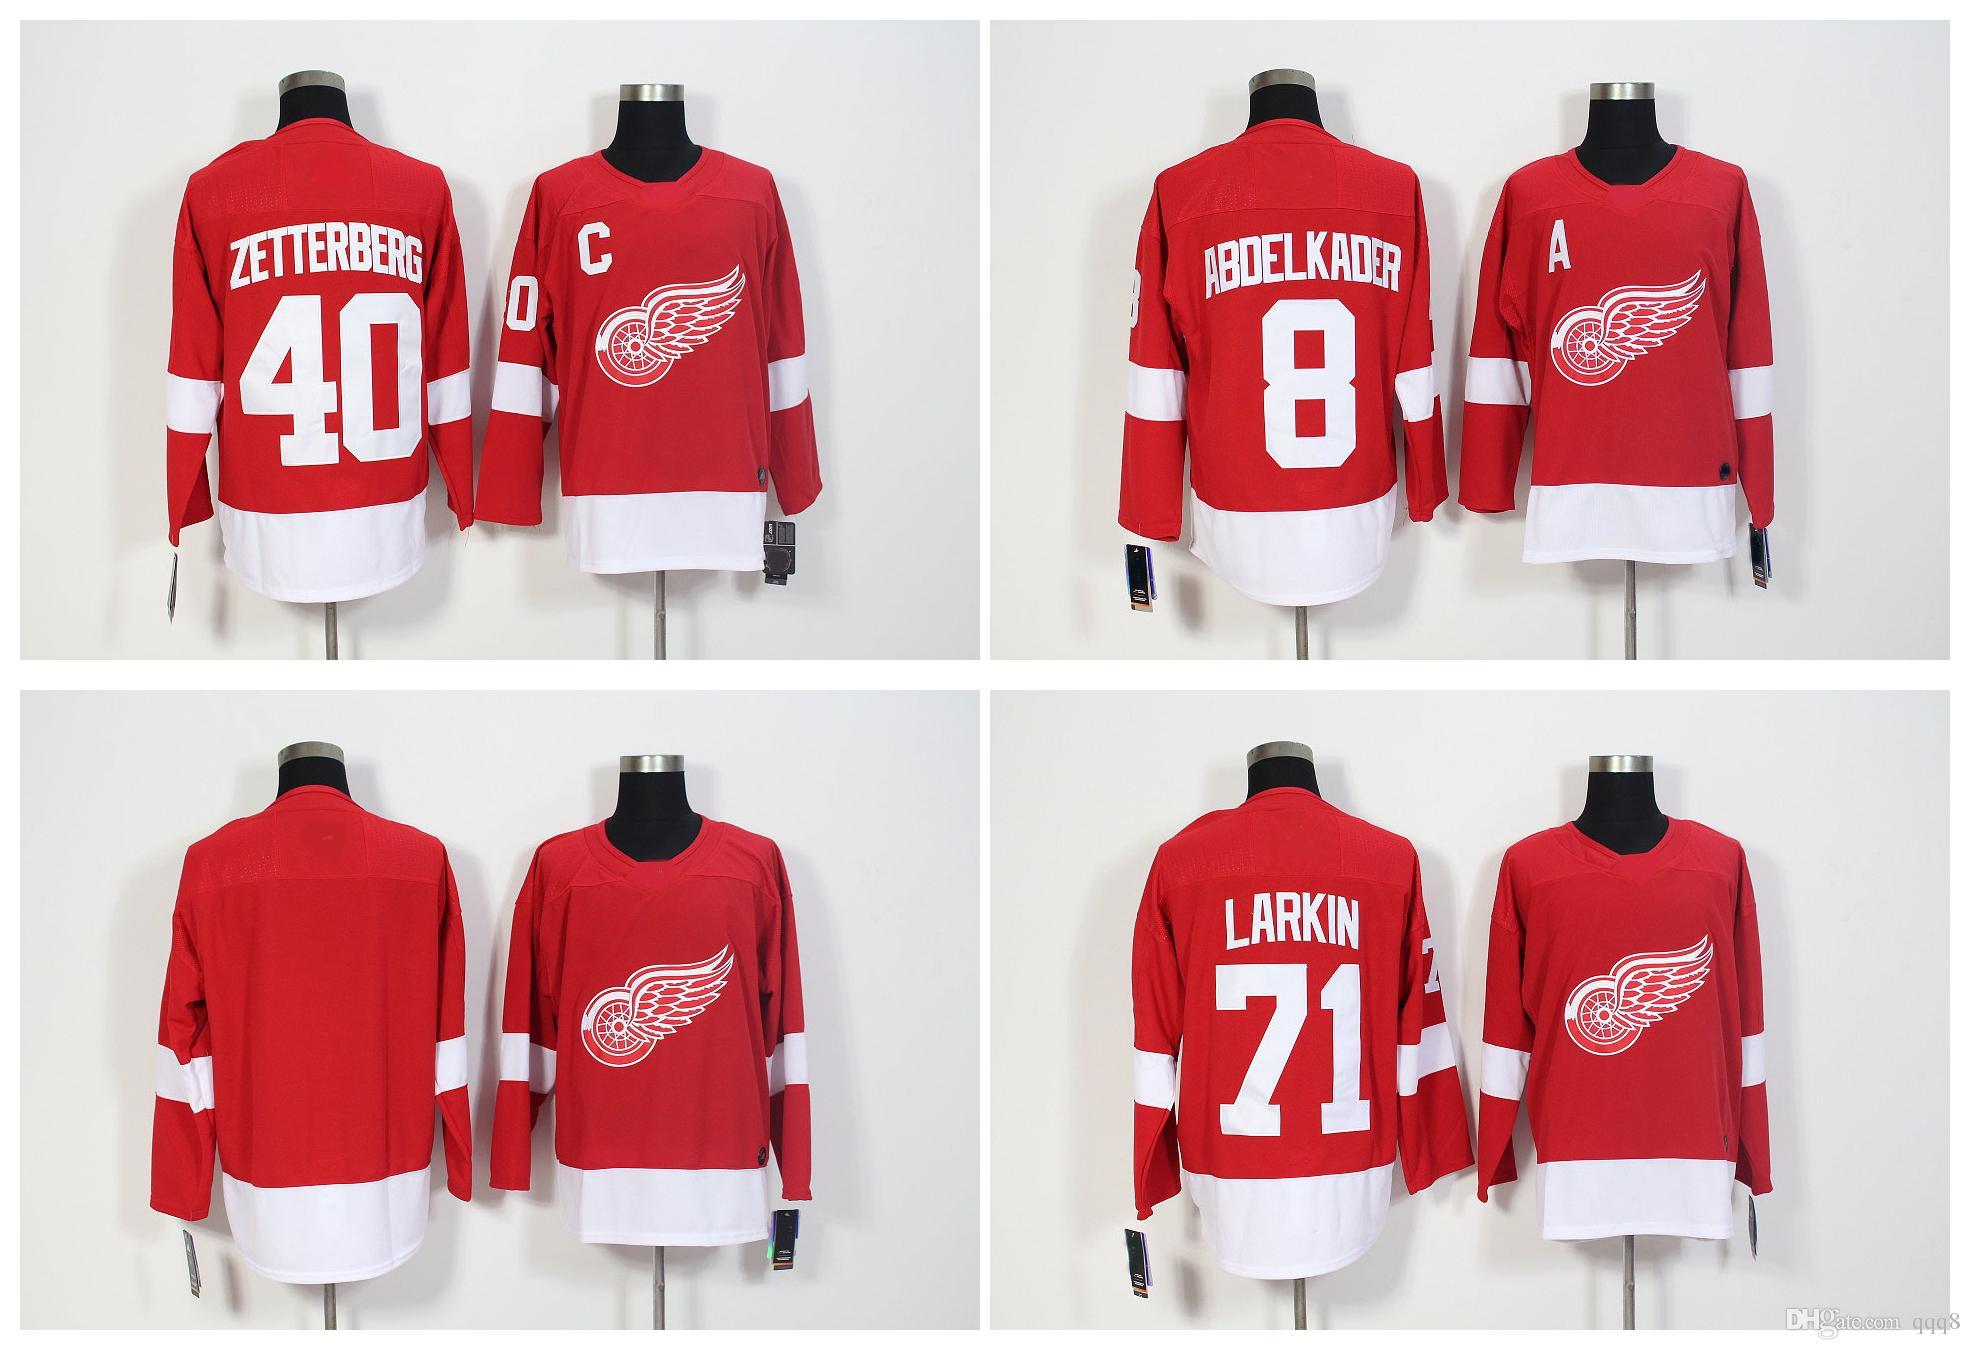 383e30a0533 2019 2018 Season AD Detroit Red Wings Jersey 40 Henrik Zetterberg 71 Dylan  Larkin 8 Justin Abdelkader Blank Stitched Hockey Jerseys !